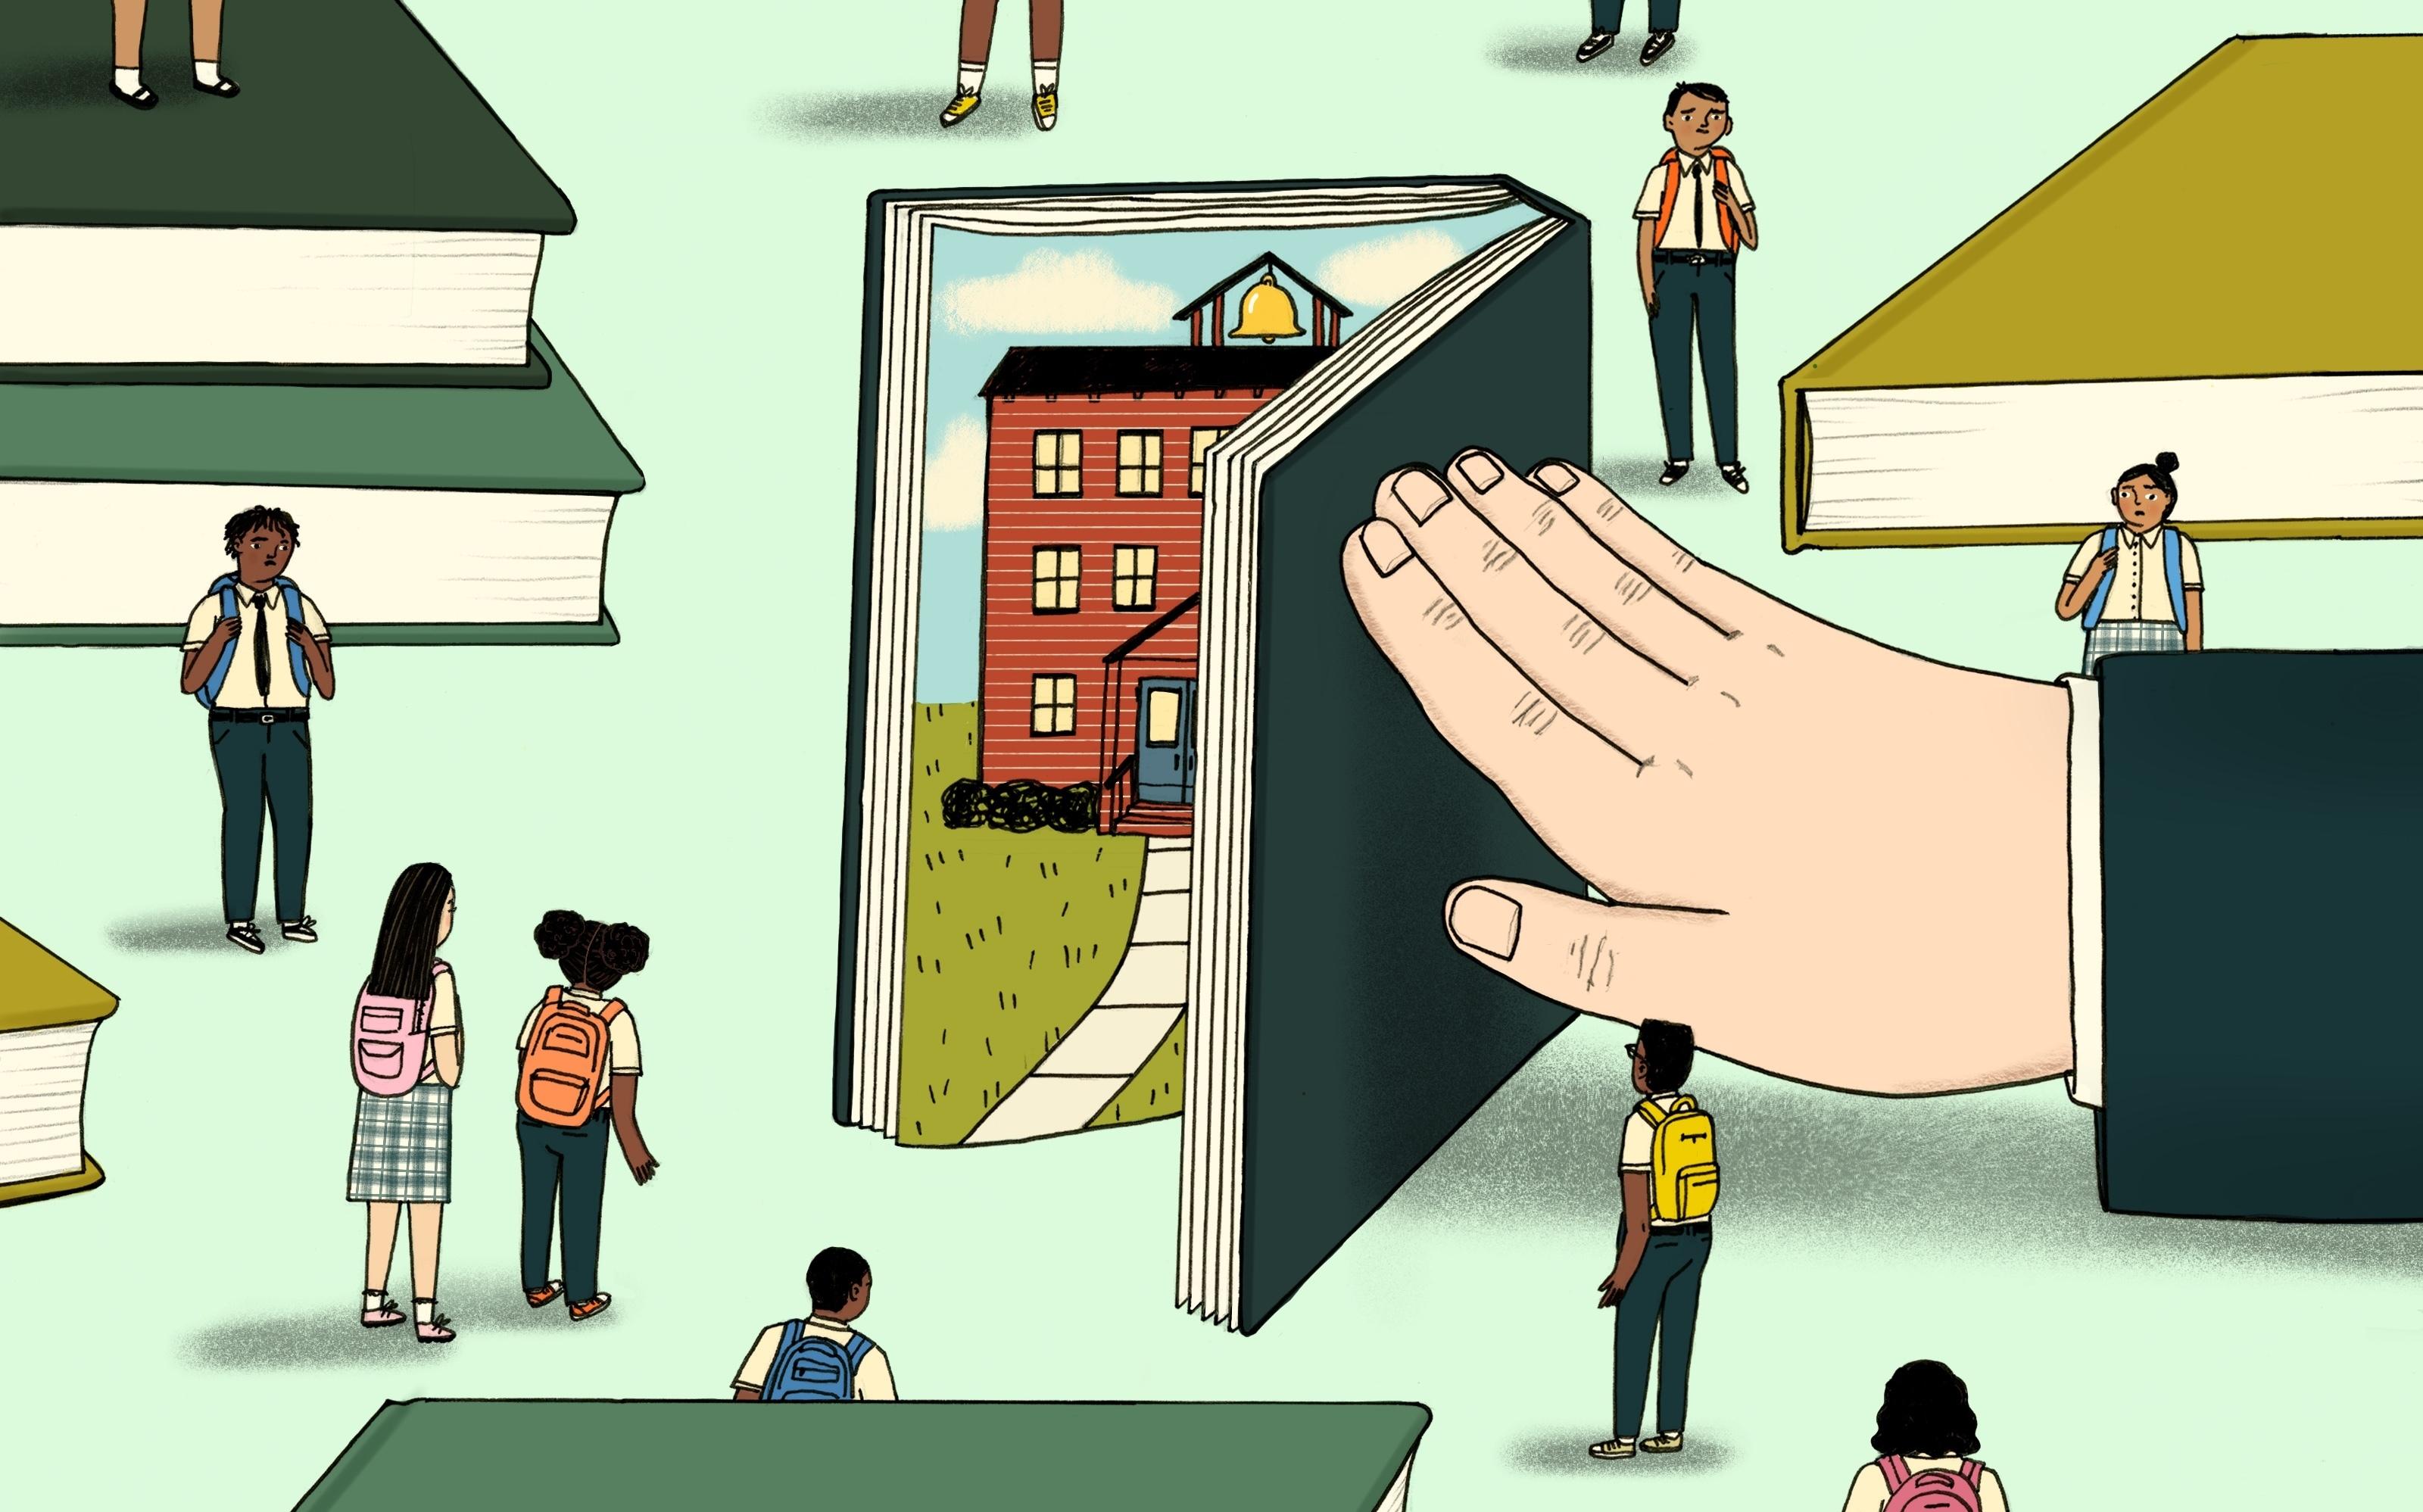 As Elite Campuses Diversify, A 'Bias Towards Privilege' Persists